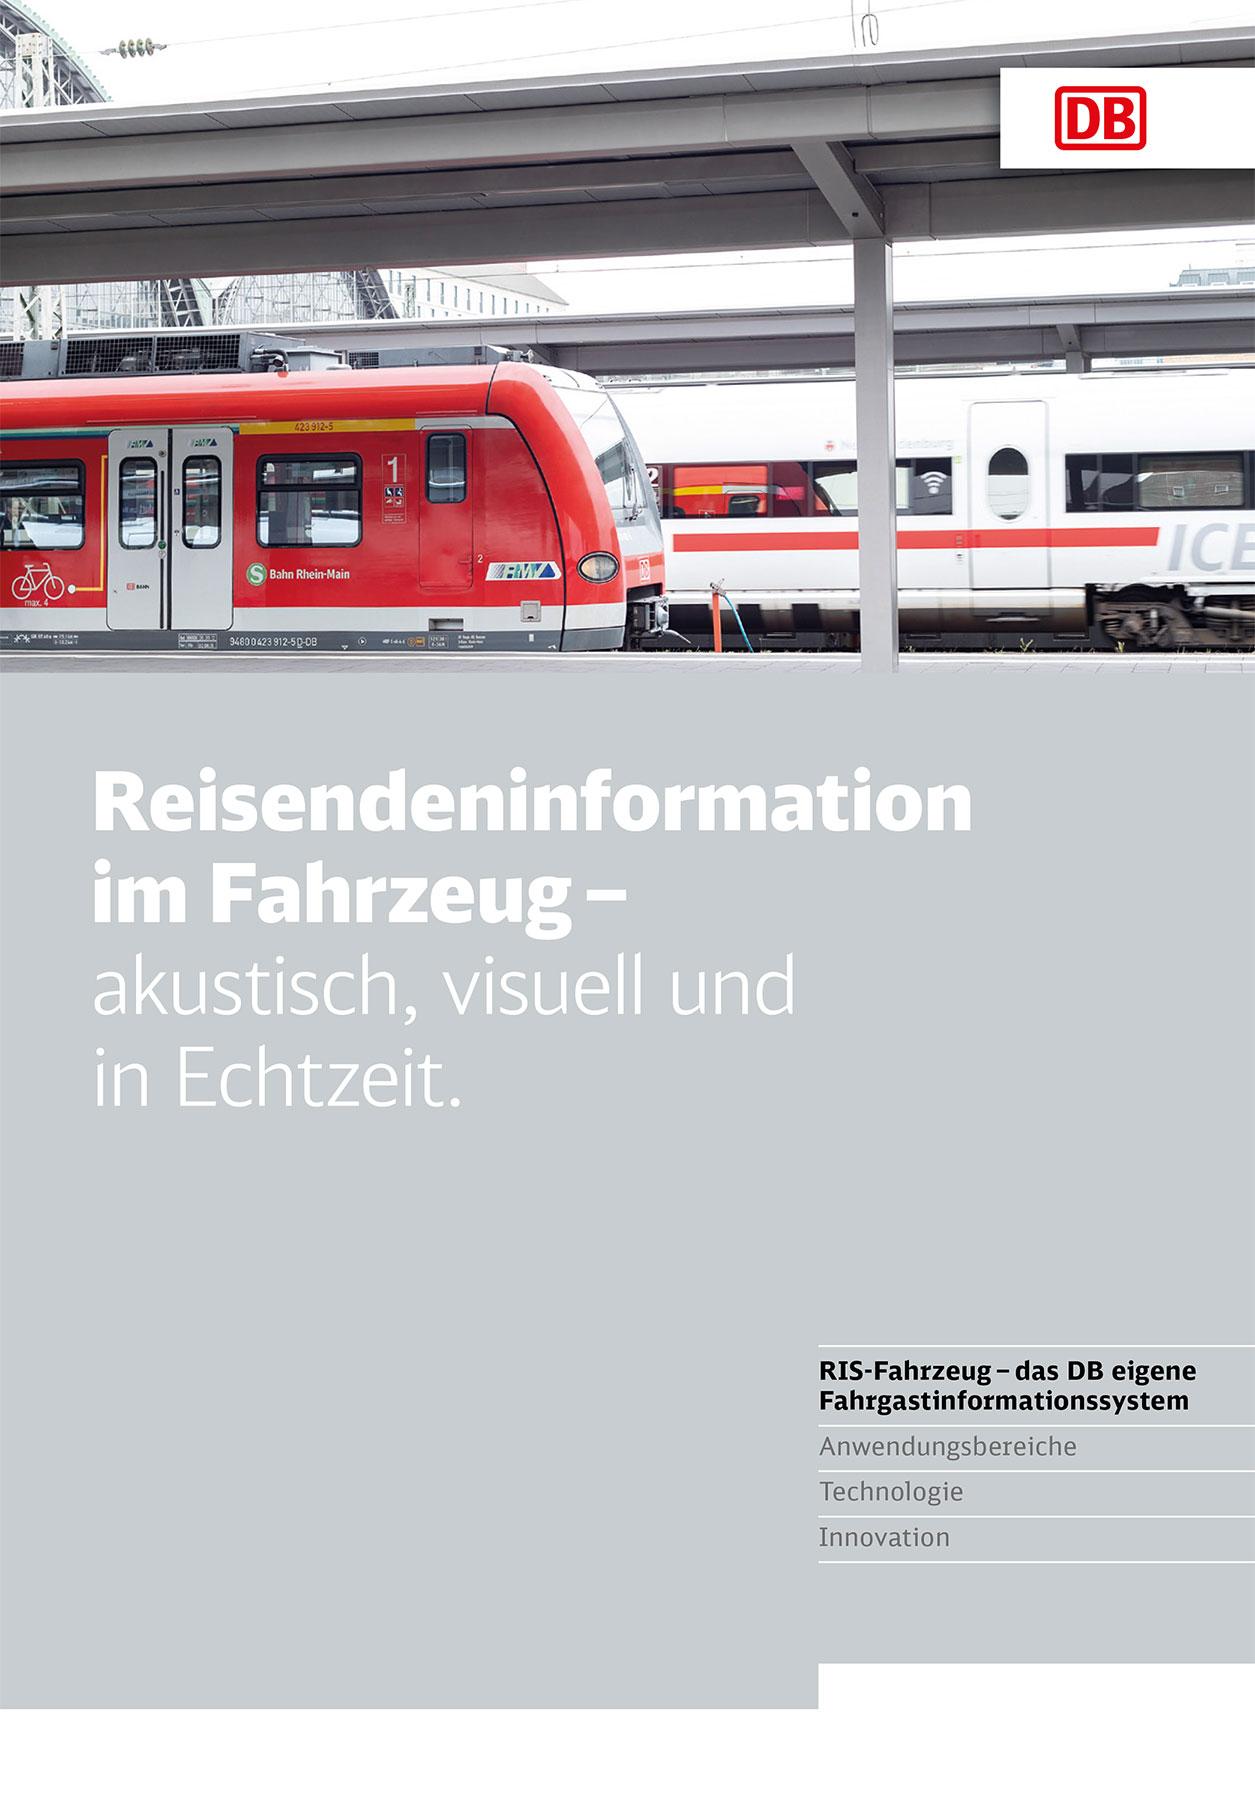 Businessfotografie Frankfurt, Storytellingfotografie, Corporate Fotografie